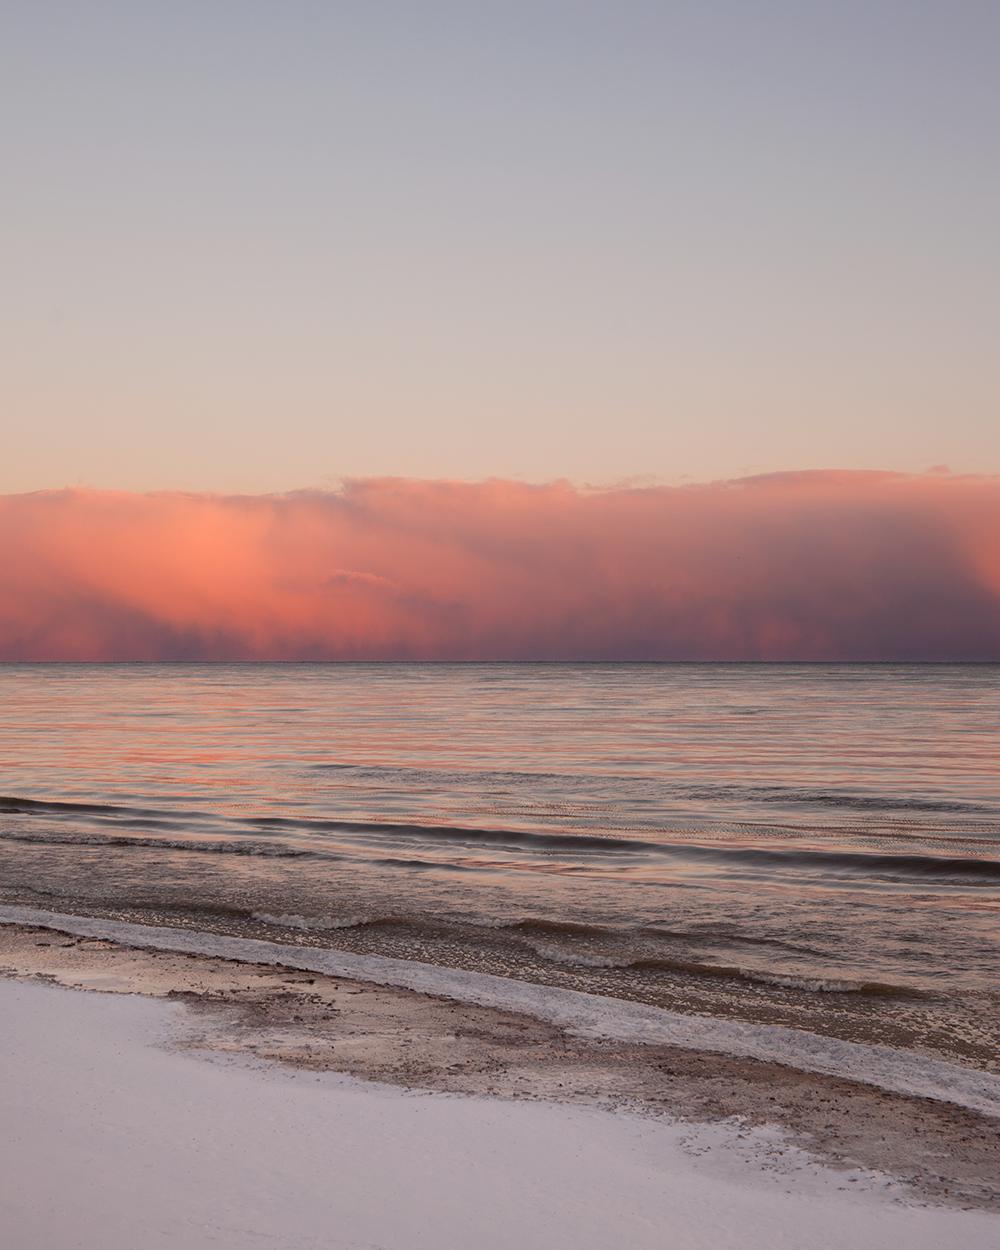 Lake Ontario, Sunrise © 2017 Tagger Yancey IV